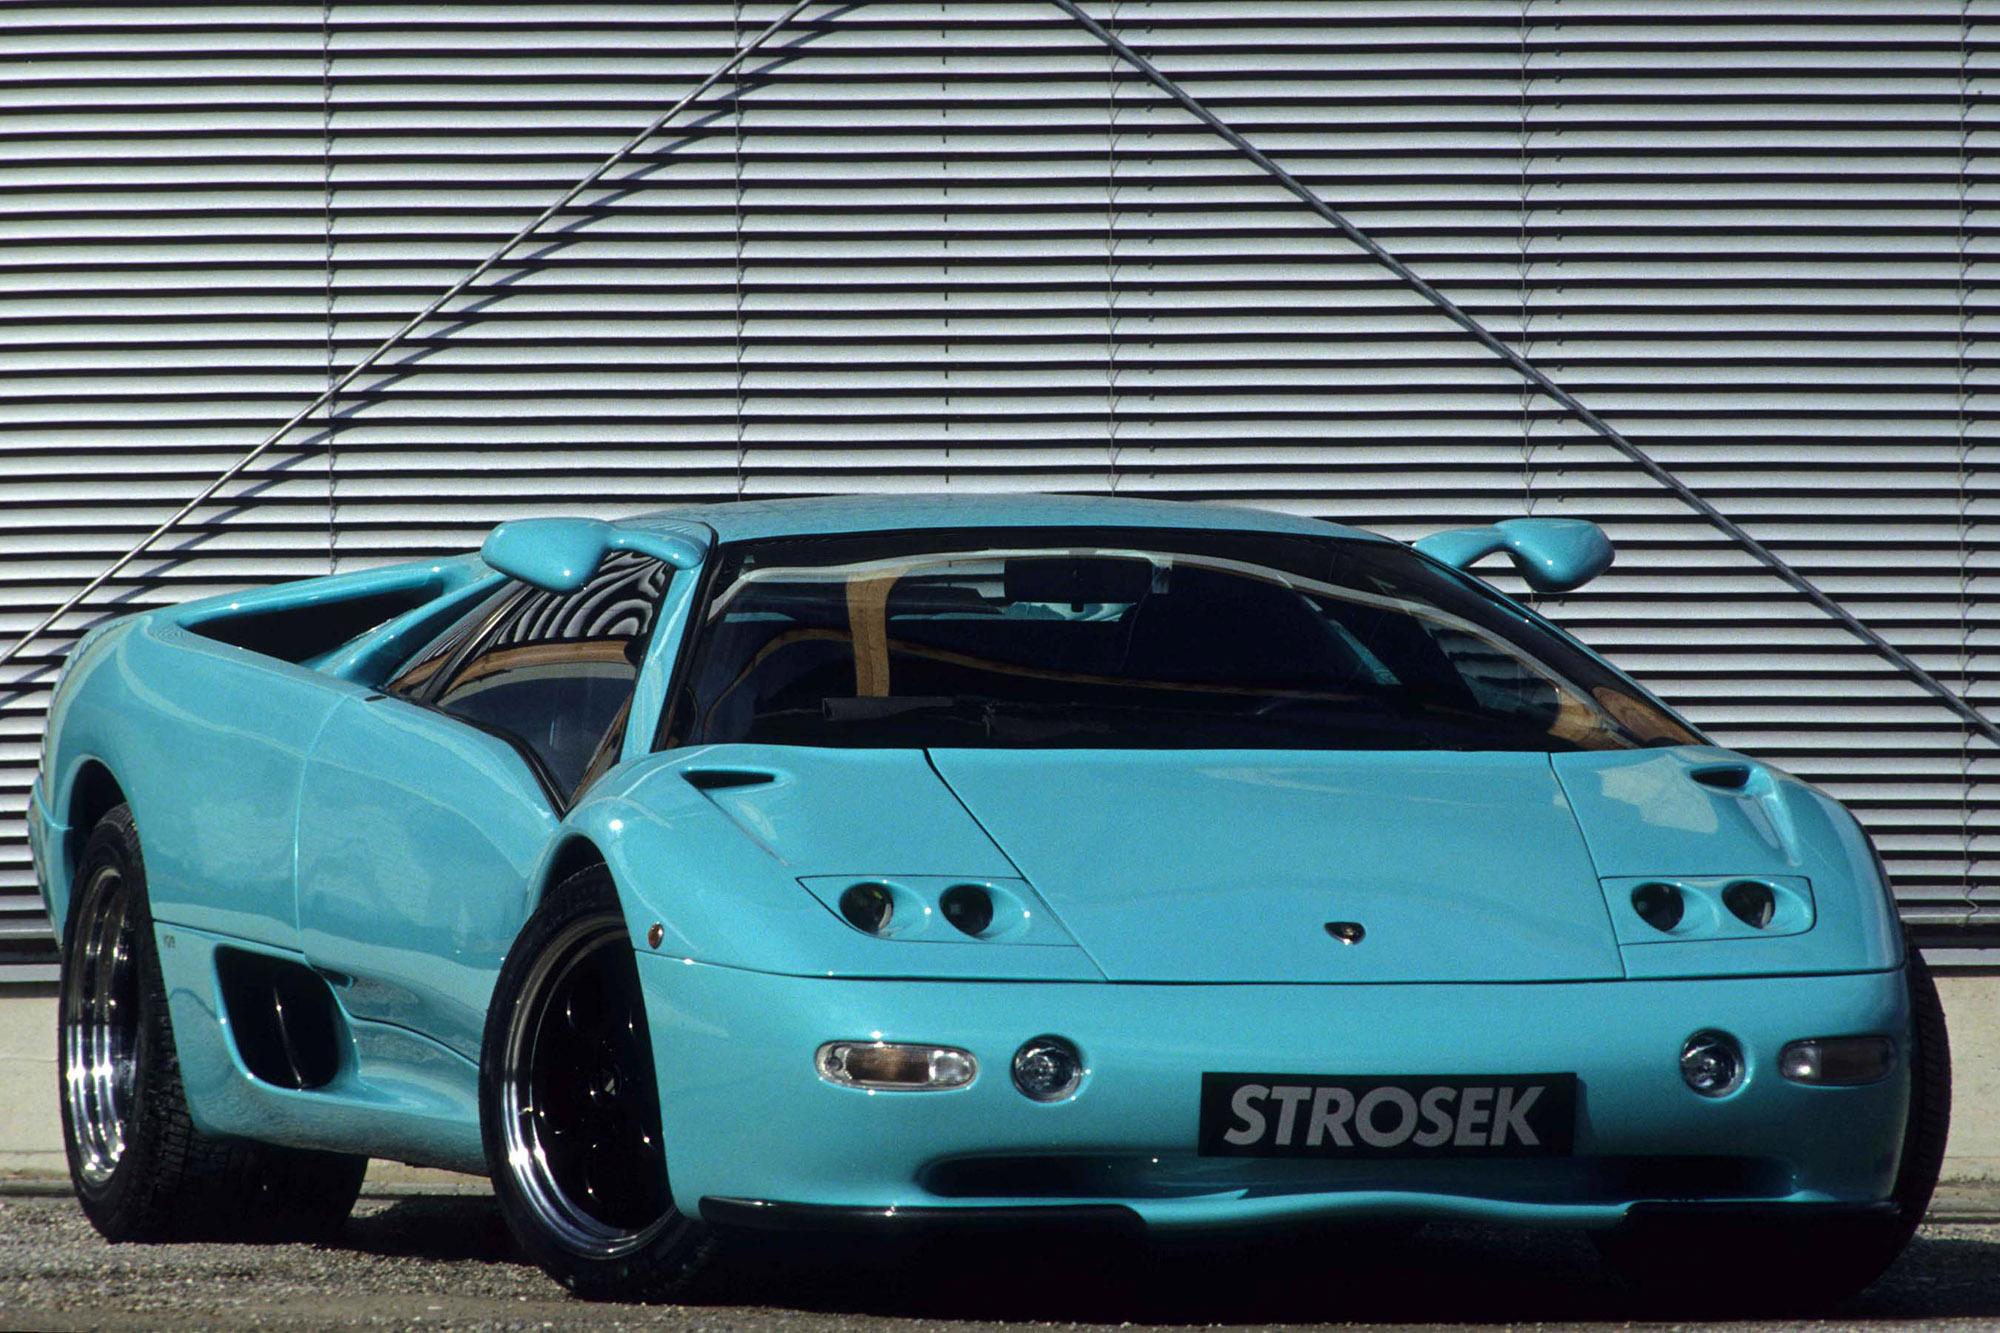 Strosek Lamborghini Diablo Photos Photogallery With 8